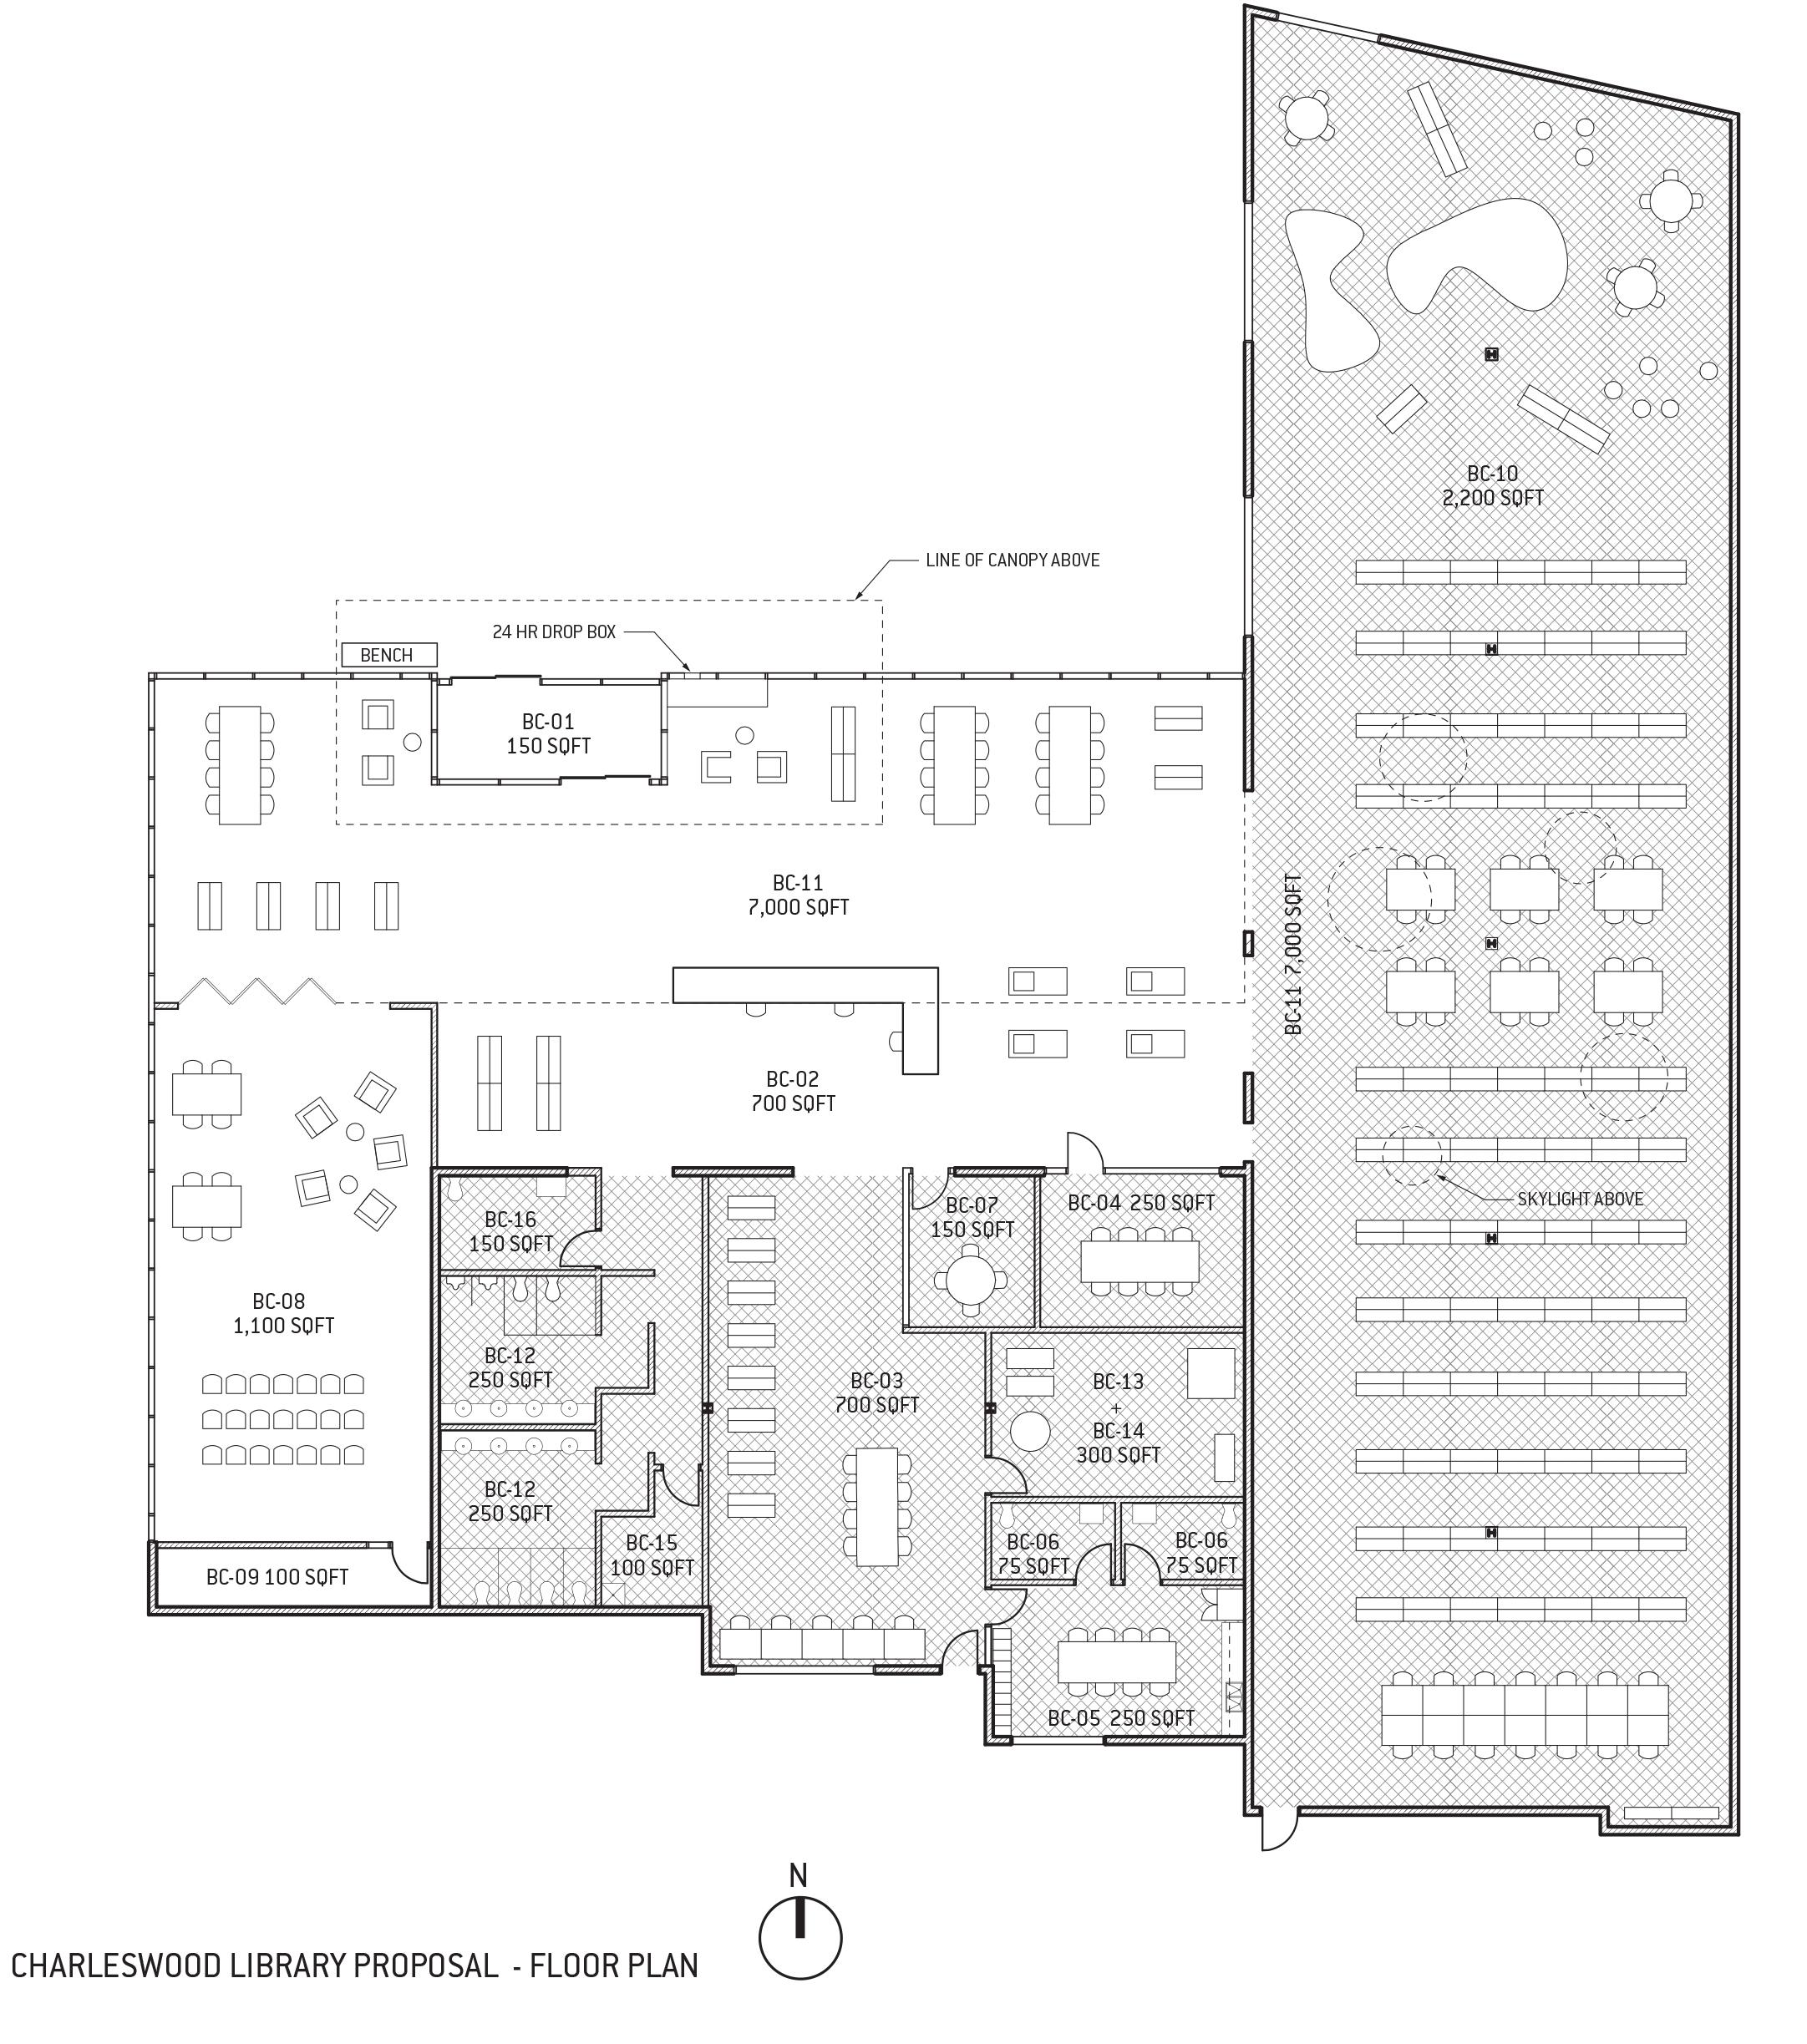 2013_08 Charleswood Library Large Floor Plan_o.jpg